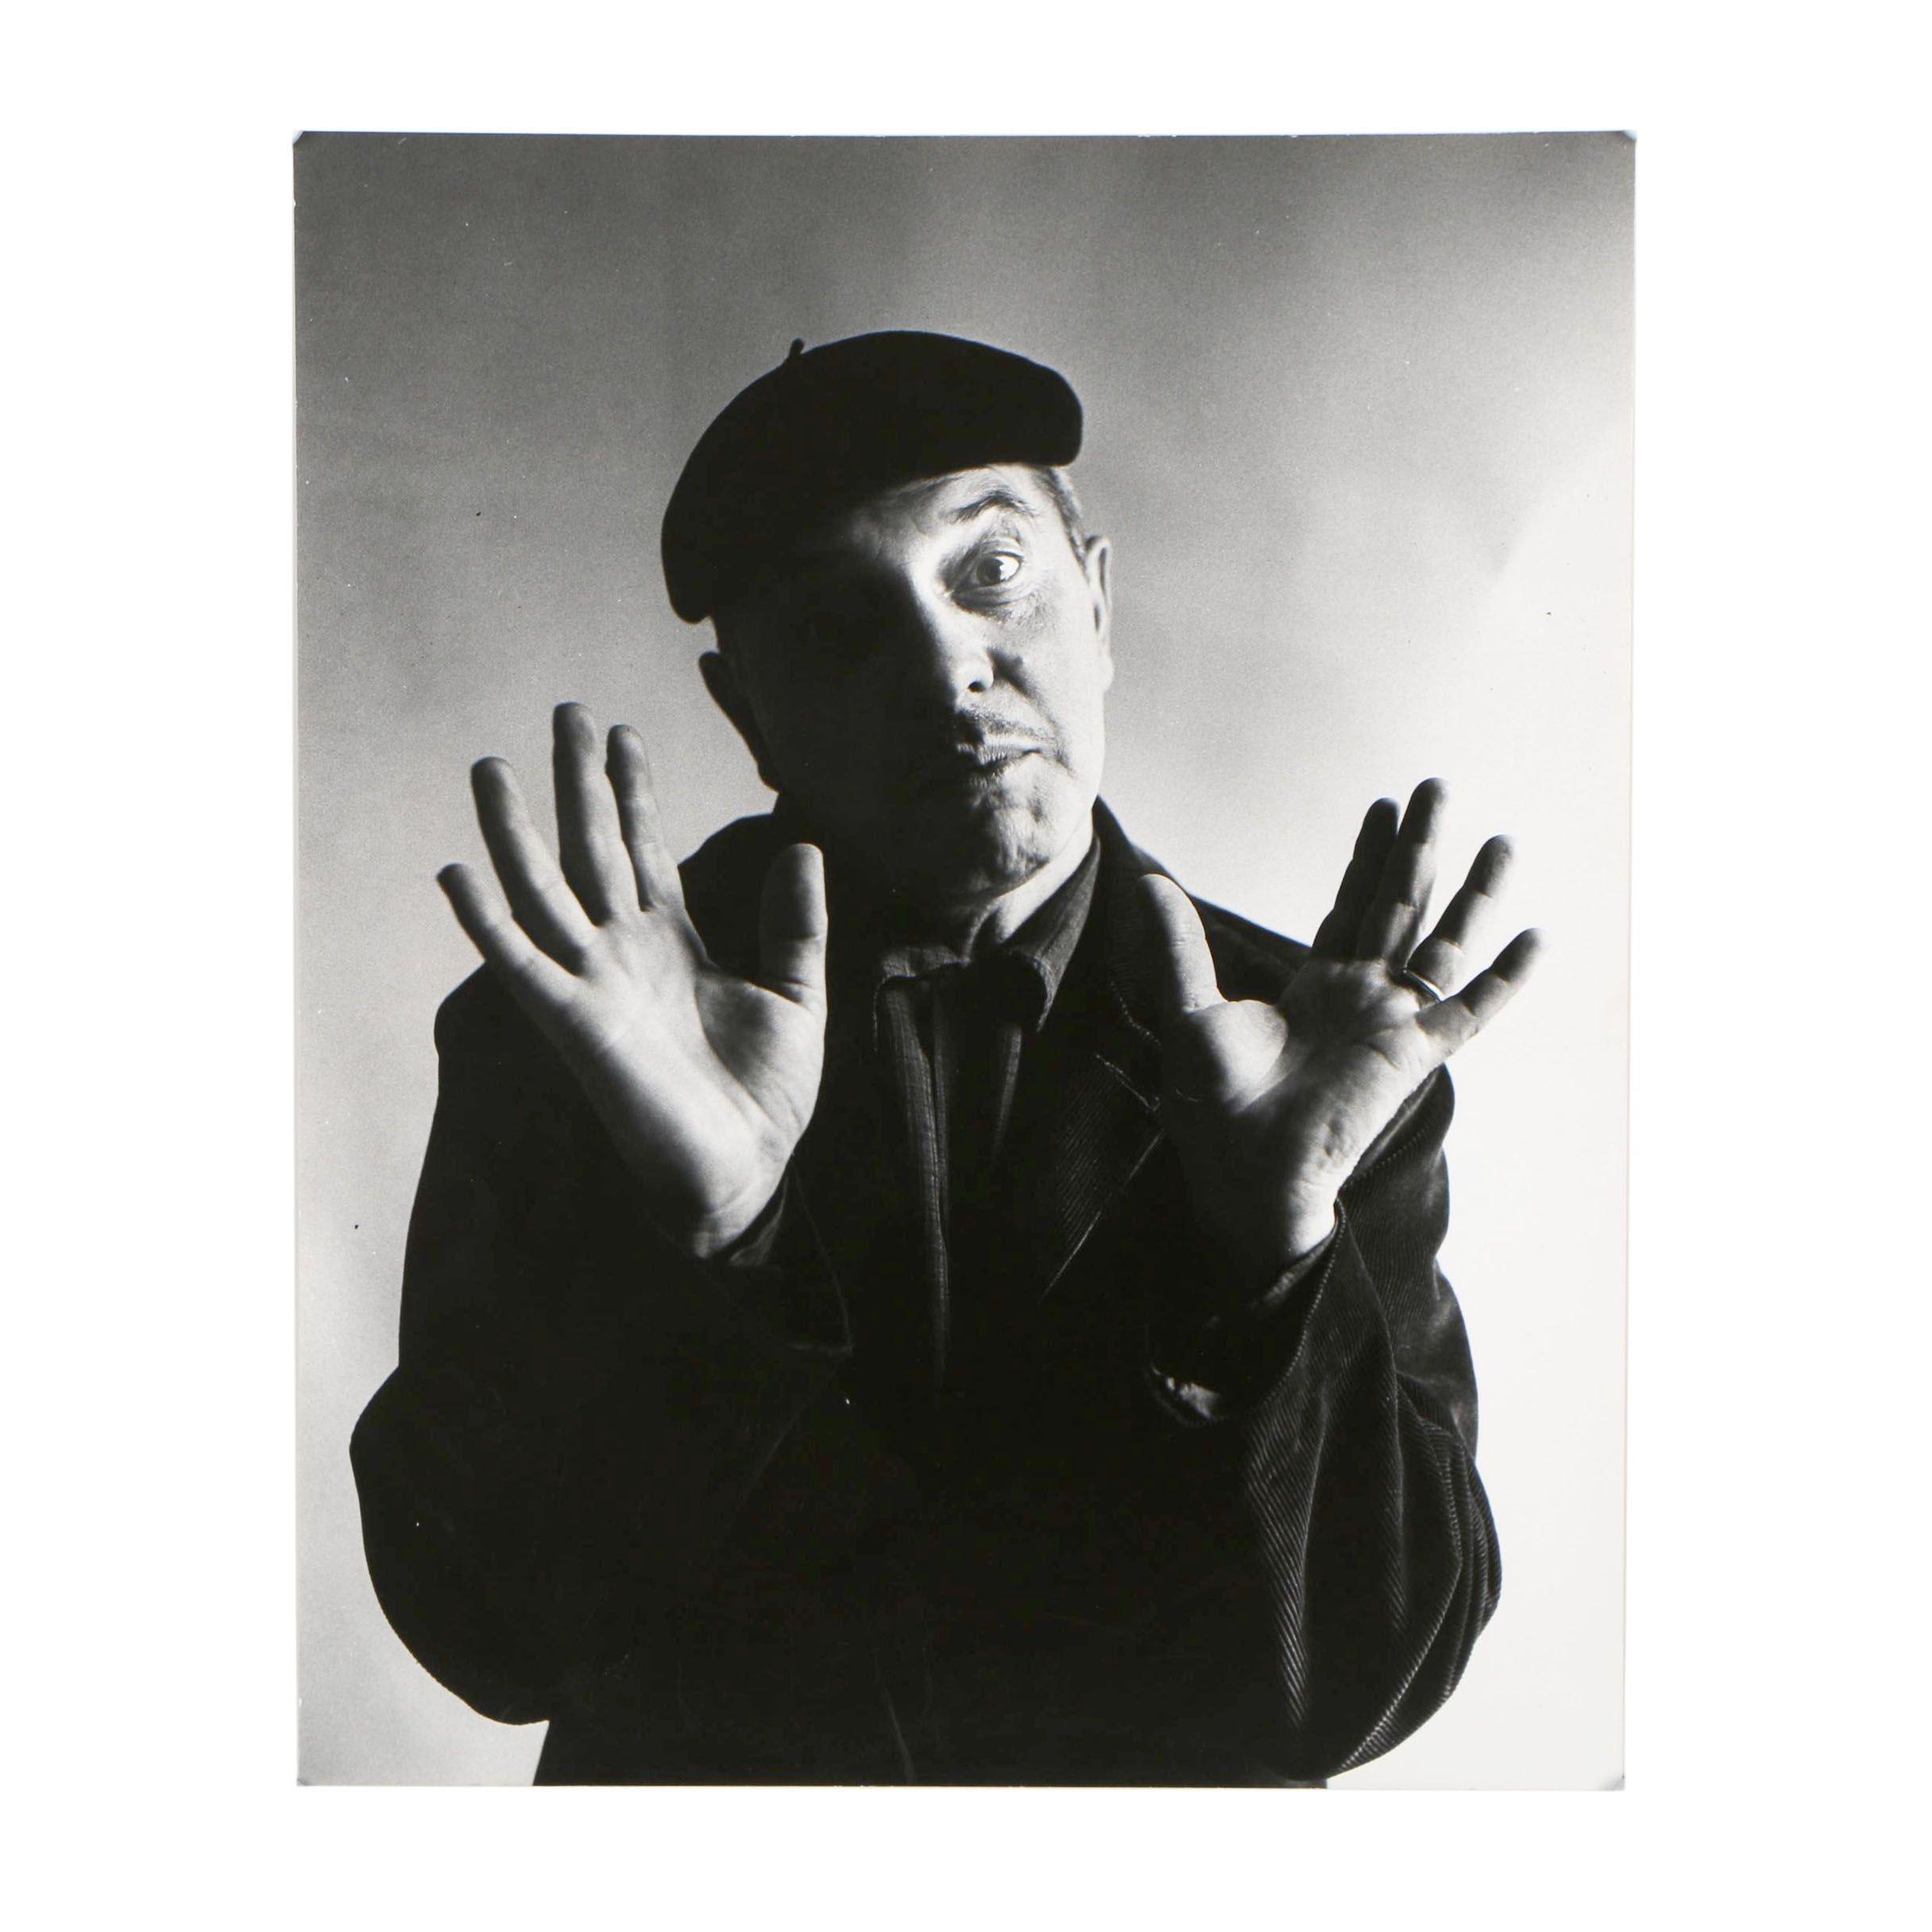 1957 Portrait Silver Gelatin Photograph